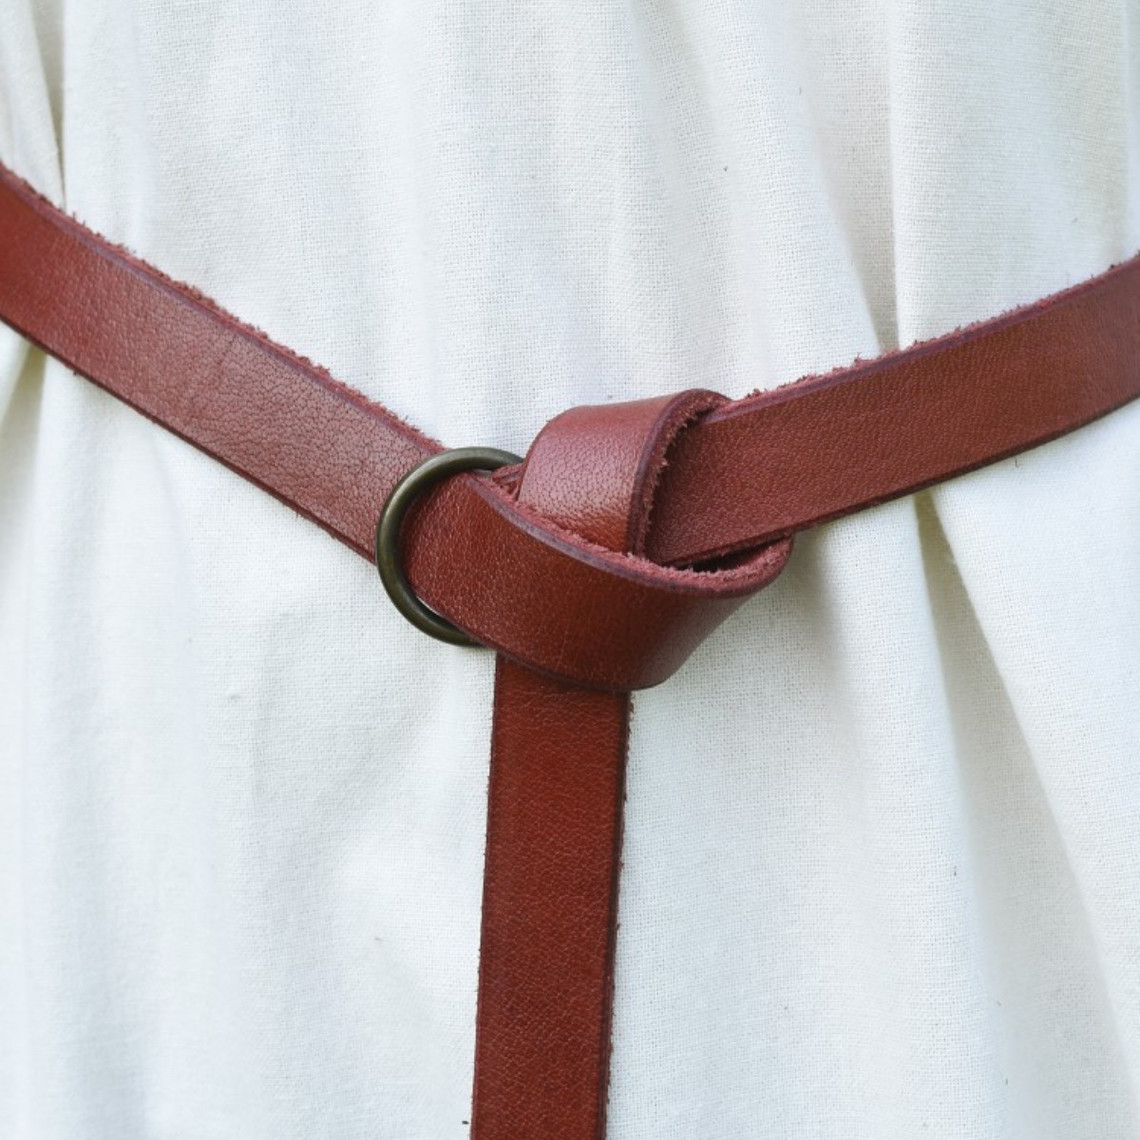 Deepeeka correa del anillo 190 cm, rojo